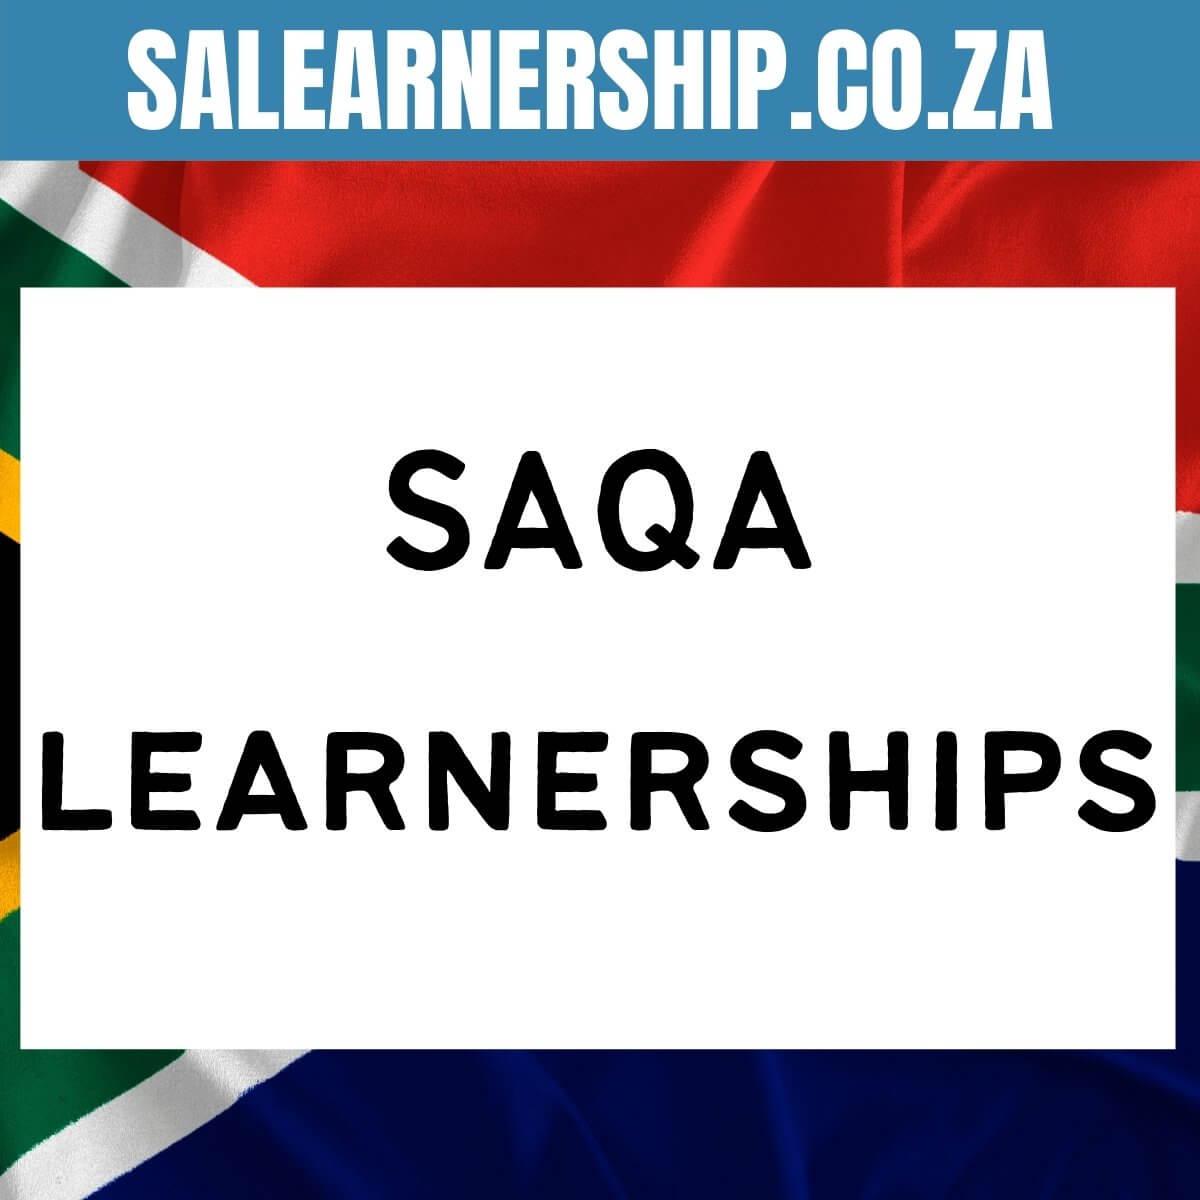 SAQA learnerships